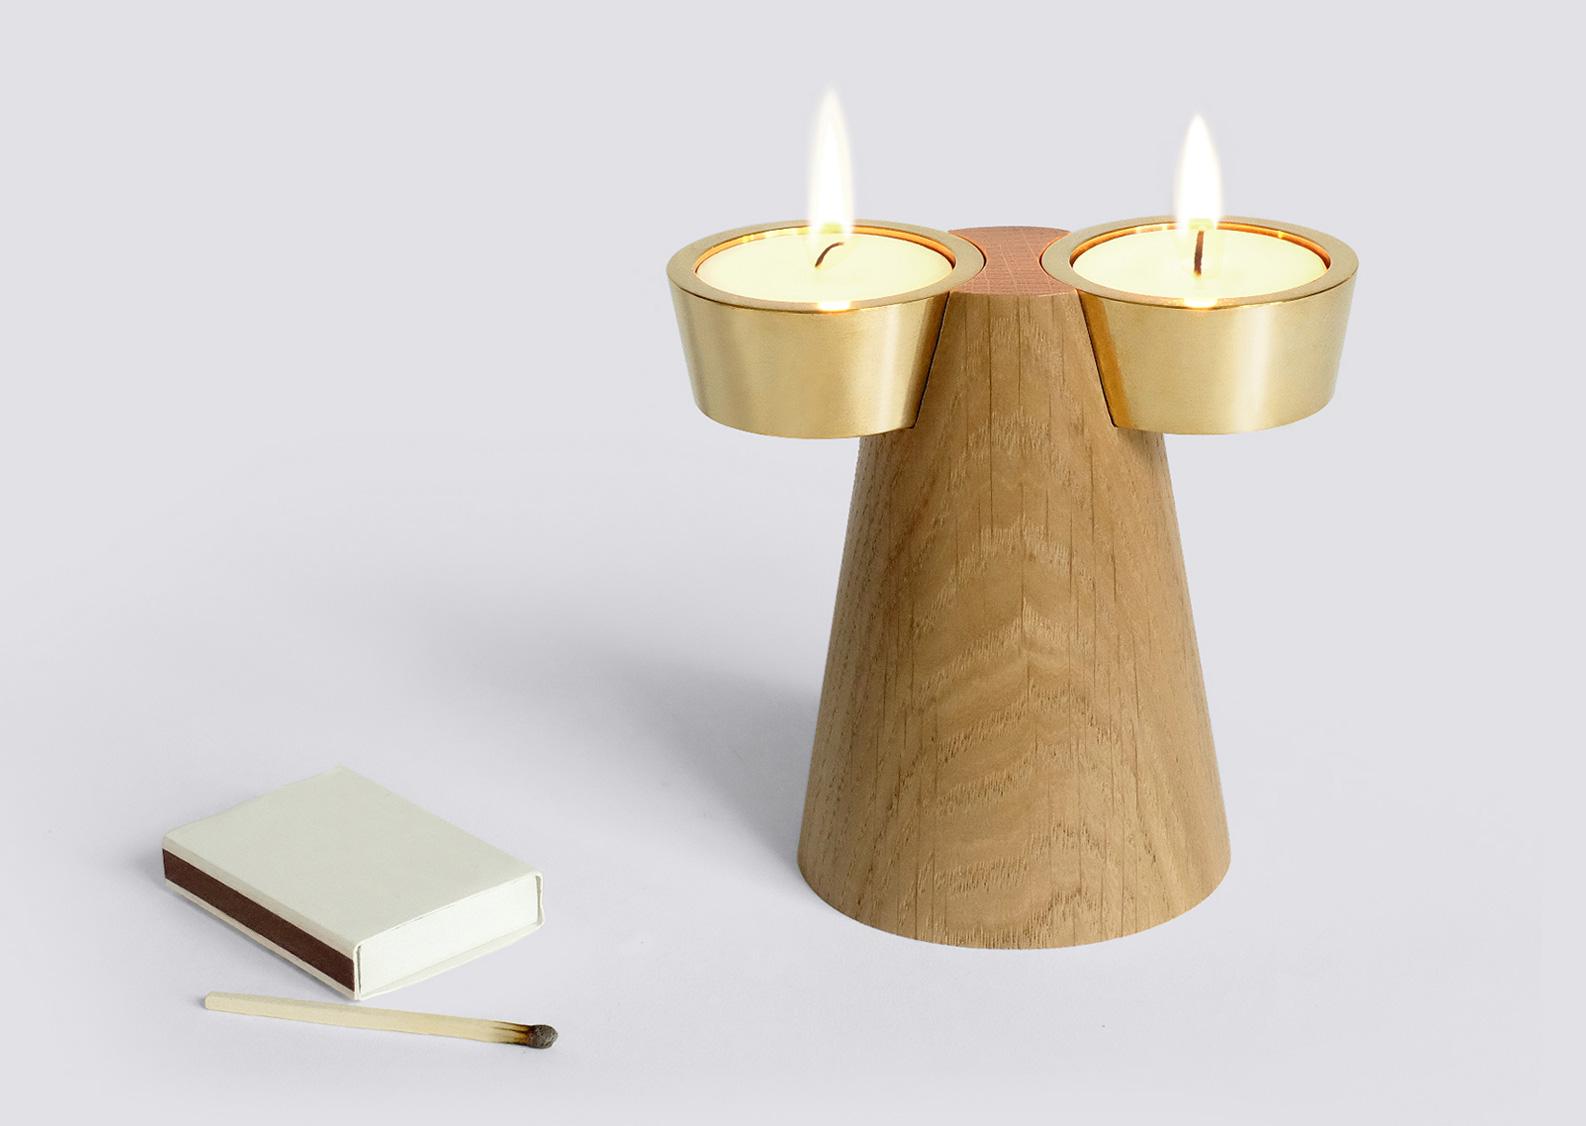 Faro Candle Holder For Caussa Studio Kowalewski